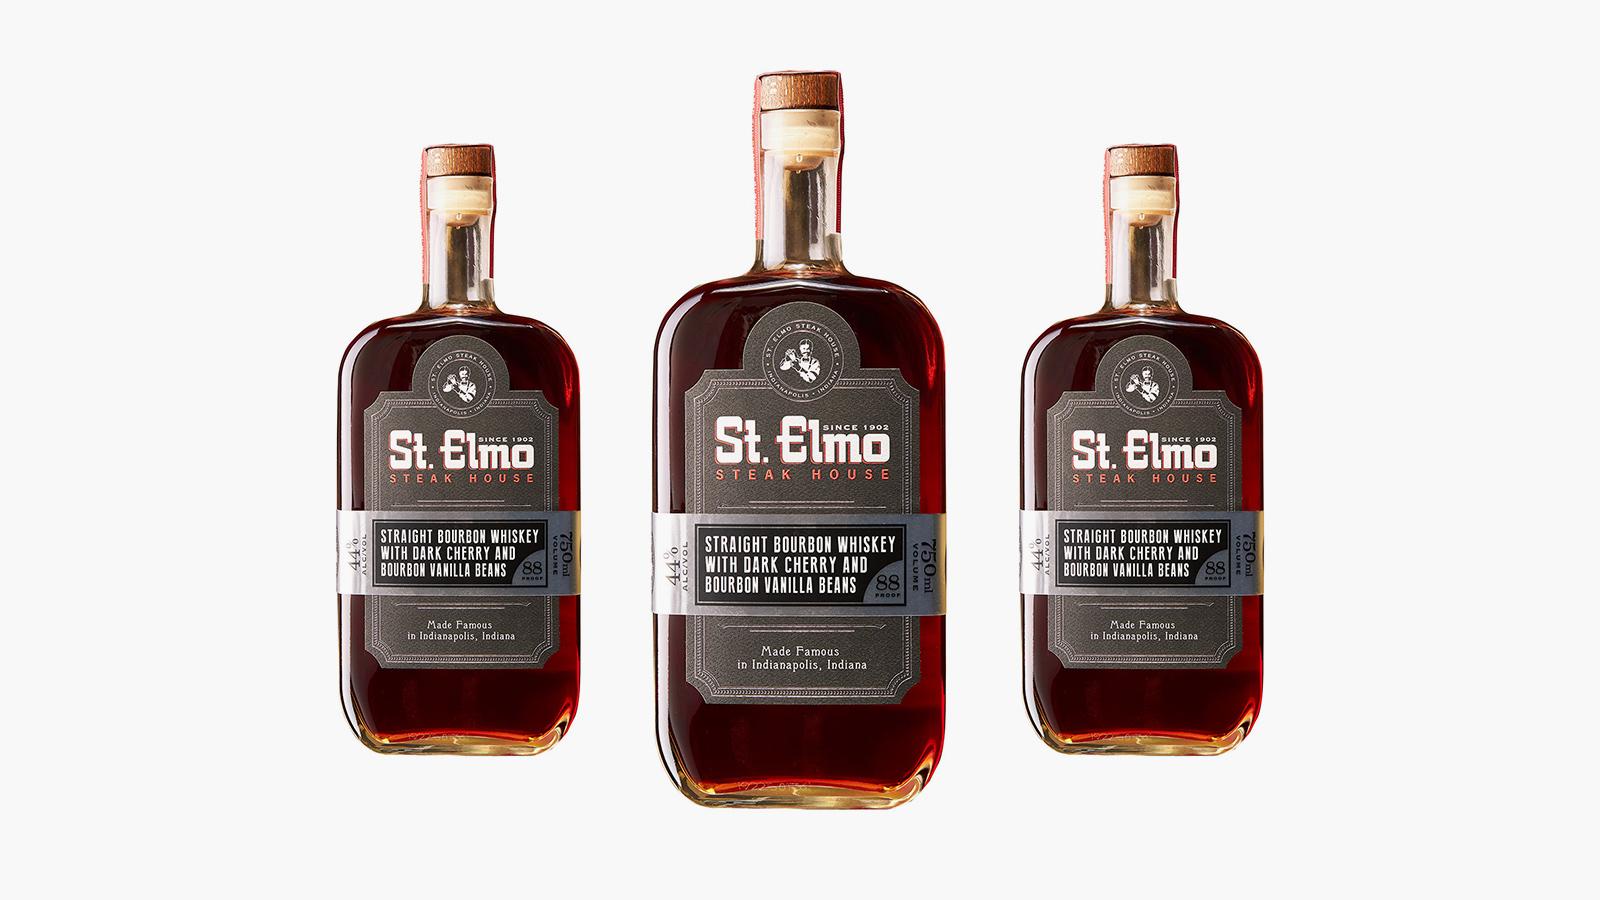 St. Elmo Straight Bourbon Whiskey